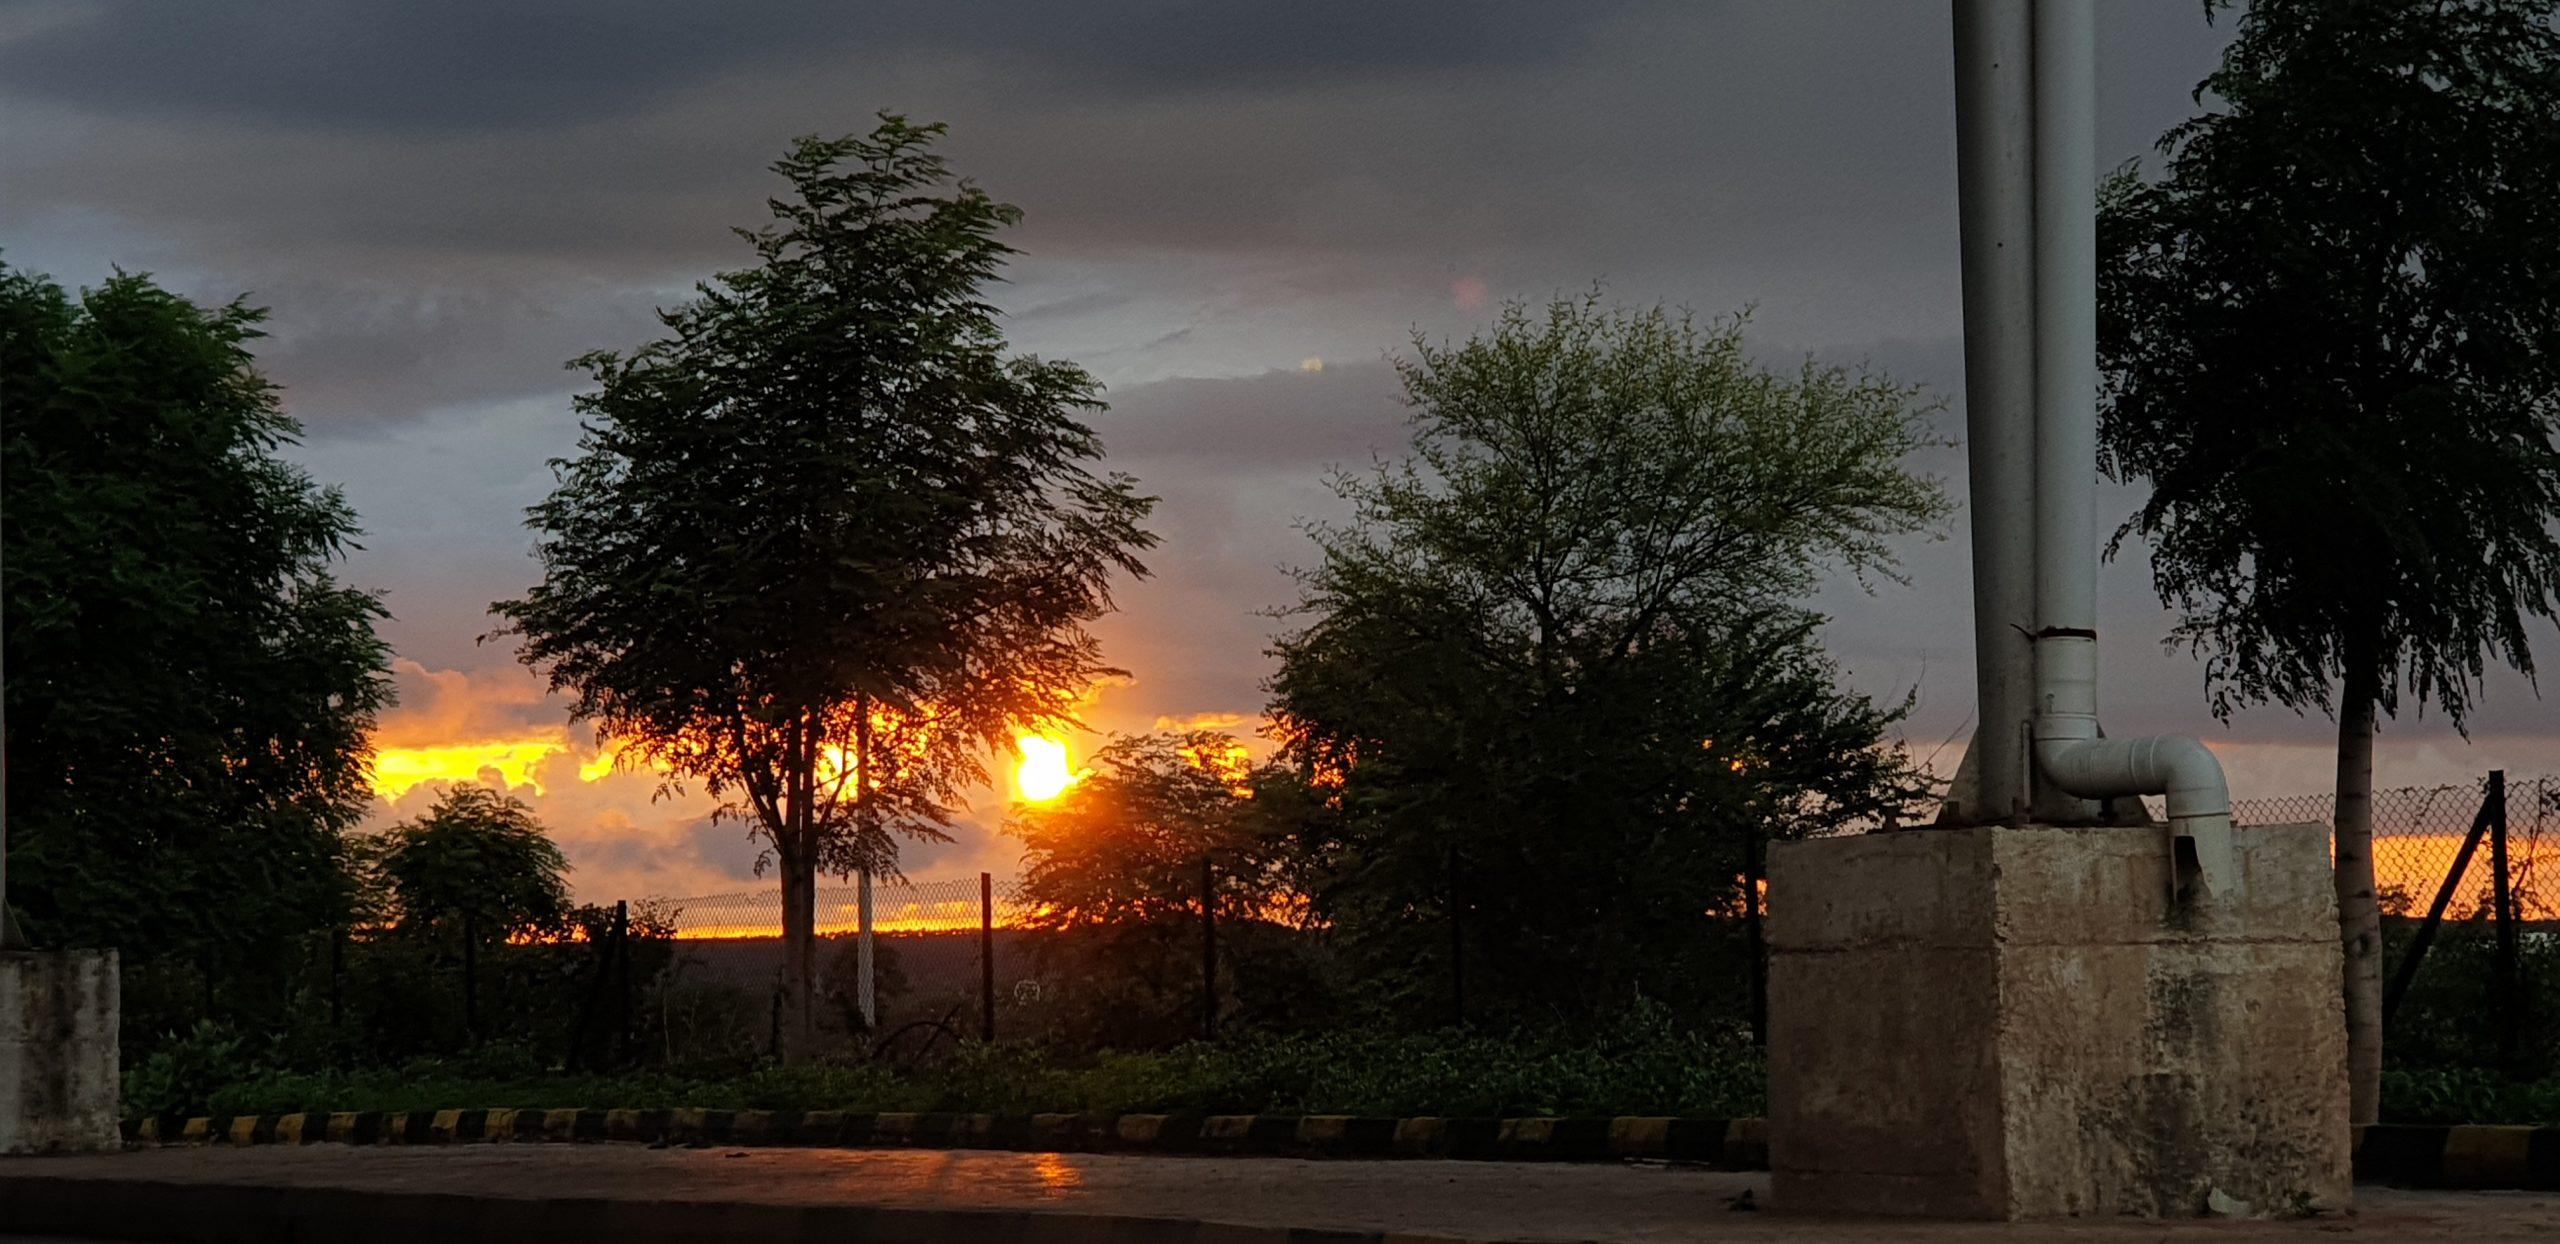 the rising sun amid trees